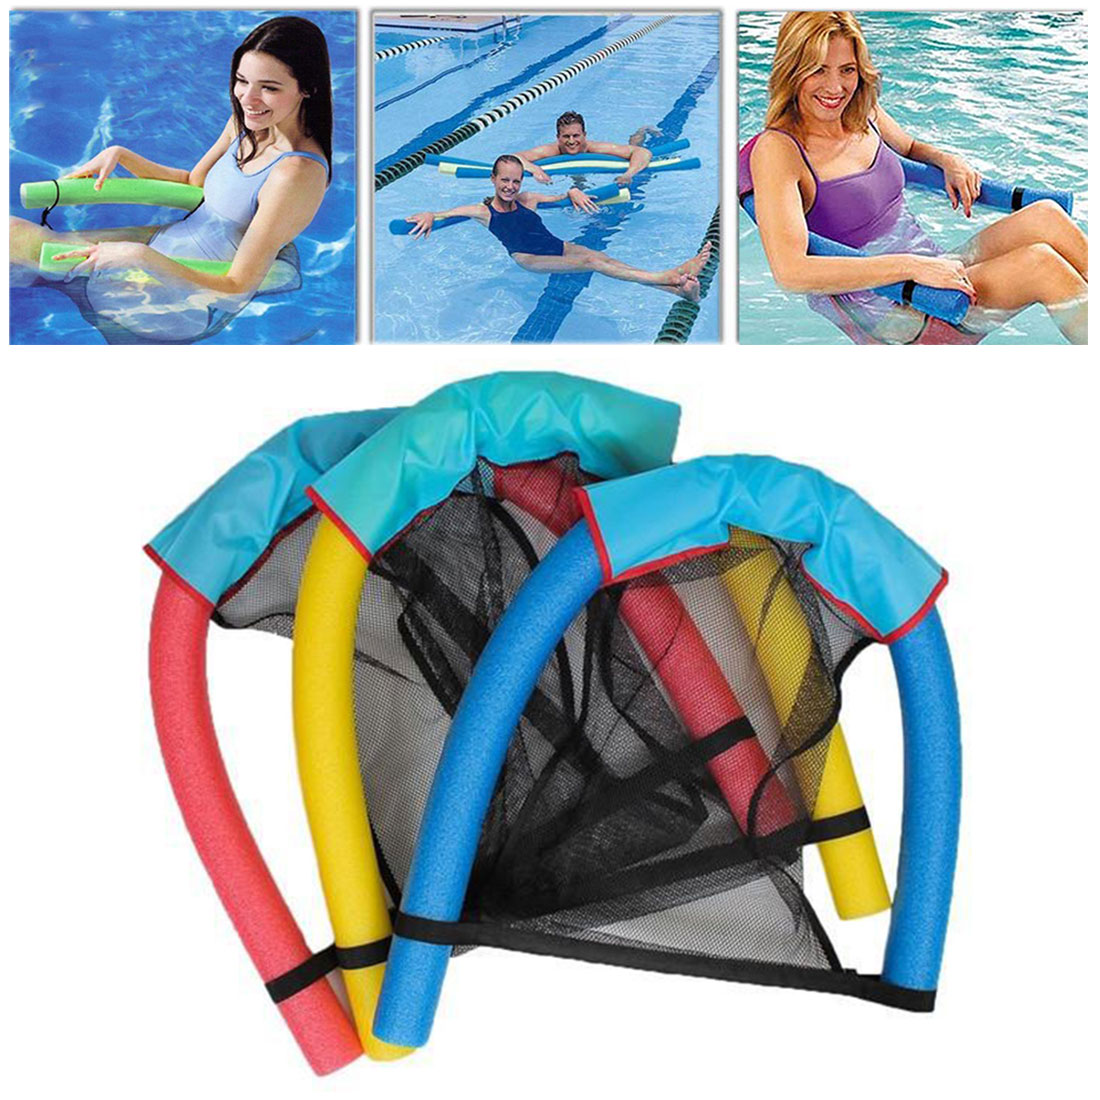 Купить с кэшбэком 1pcs floating chair adult children Floating Chair Net swimming stick children's water supplies super large buoyancy aids foam sw